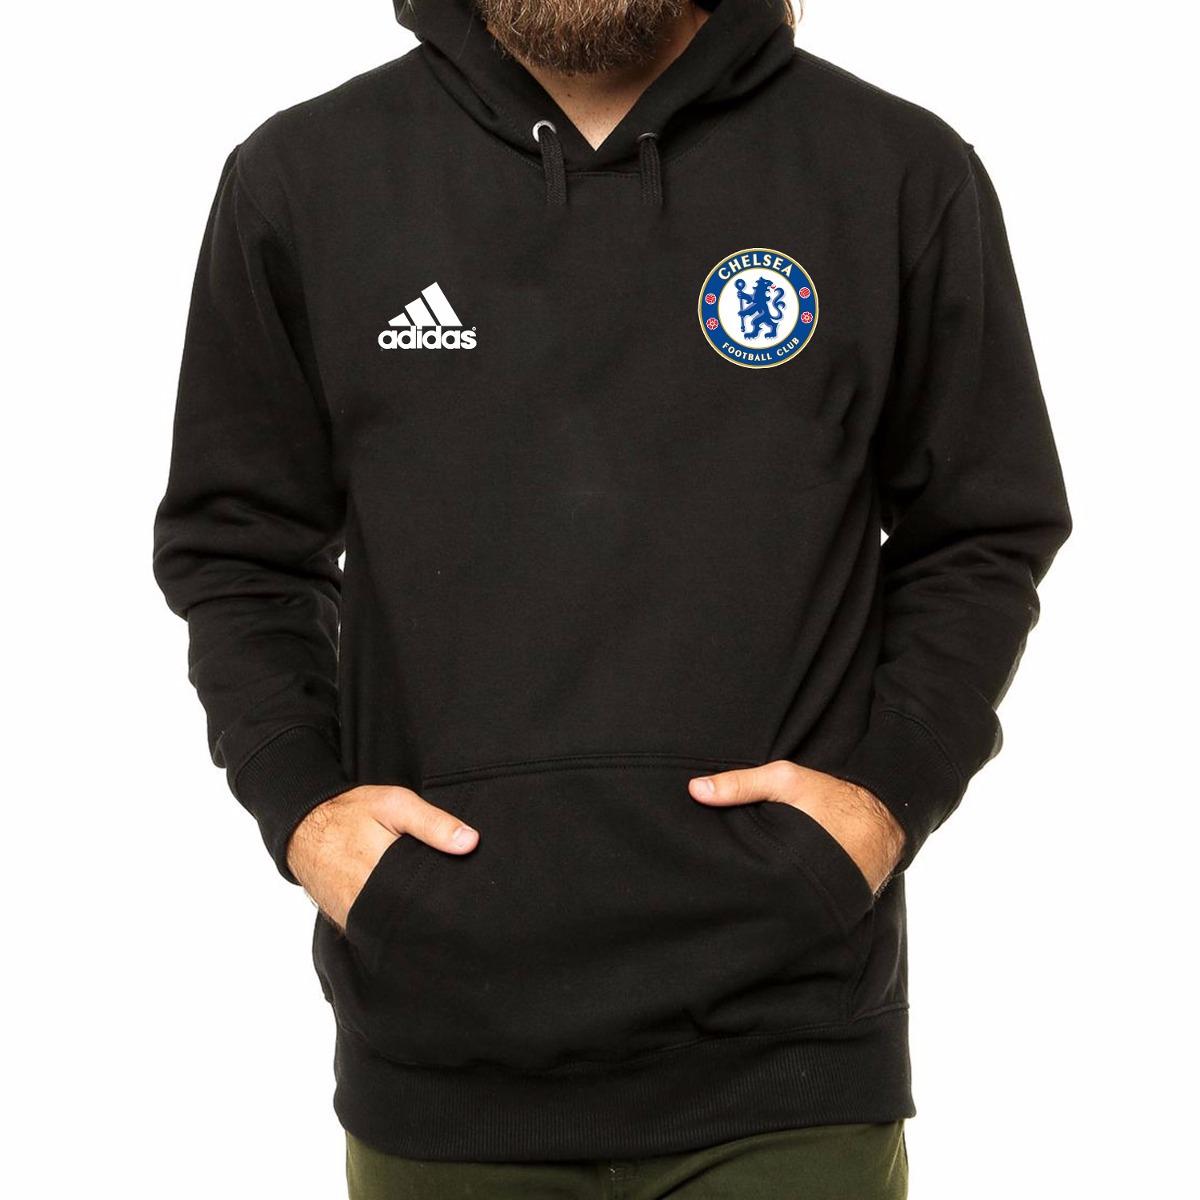 blusa moletom chelsea futebol casaco time futebol. Carregando zoom. 35ccbc0c318fa